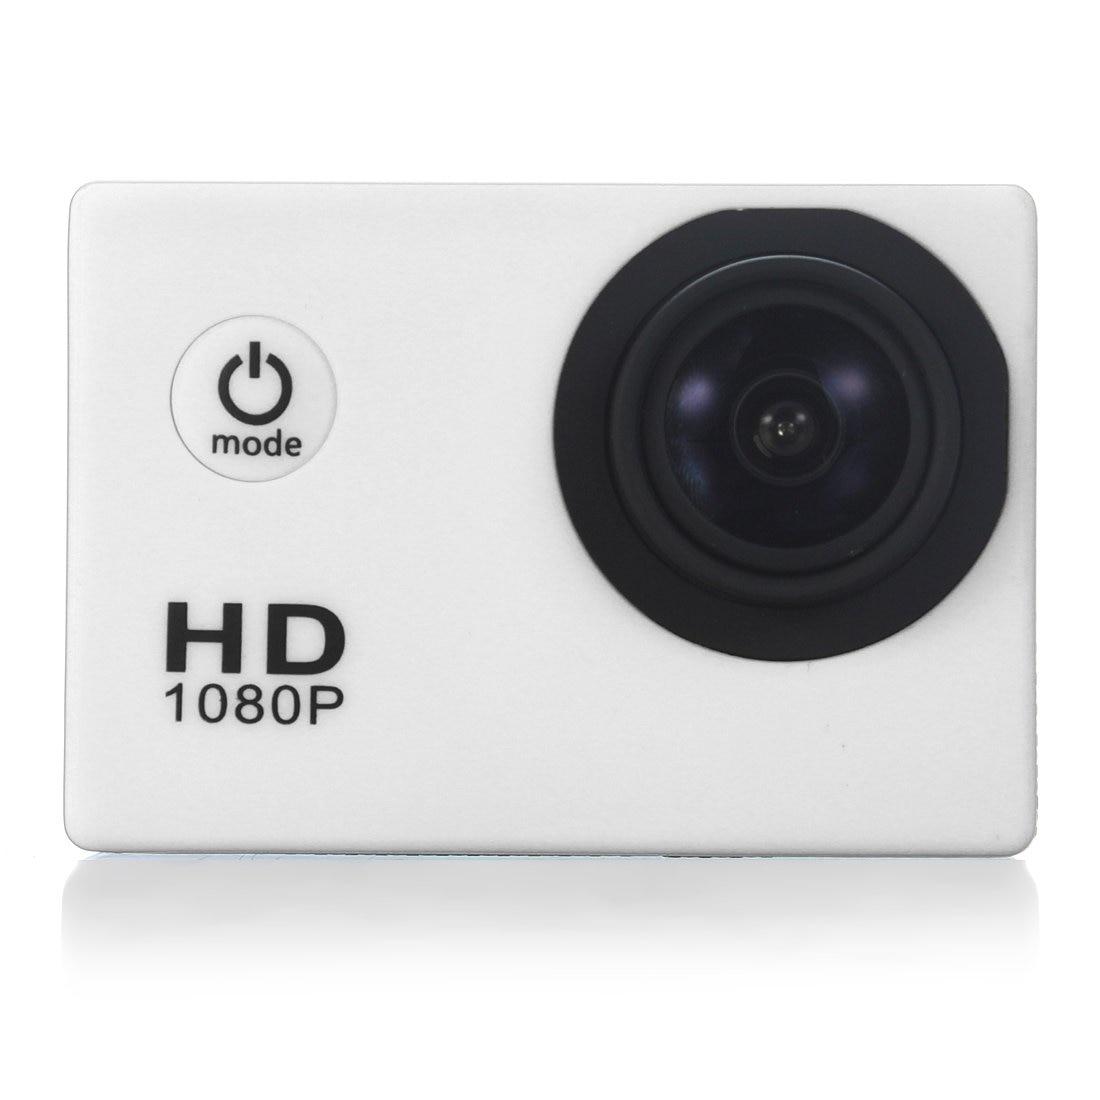 MOOL For SJ4000 Full HD 1080P Mini Sport camera action dv with waterproof shell 30M Extreme - white sjcam sj4000 2 0 inch screen action camera 1080p full hd waterproof 30m diving sj cam 4000 sport dv bike mini helmet camcorder